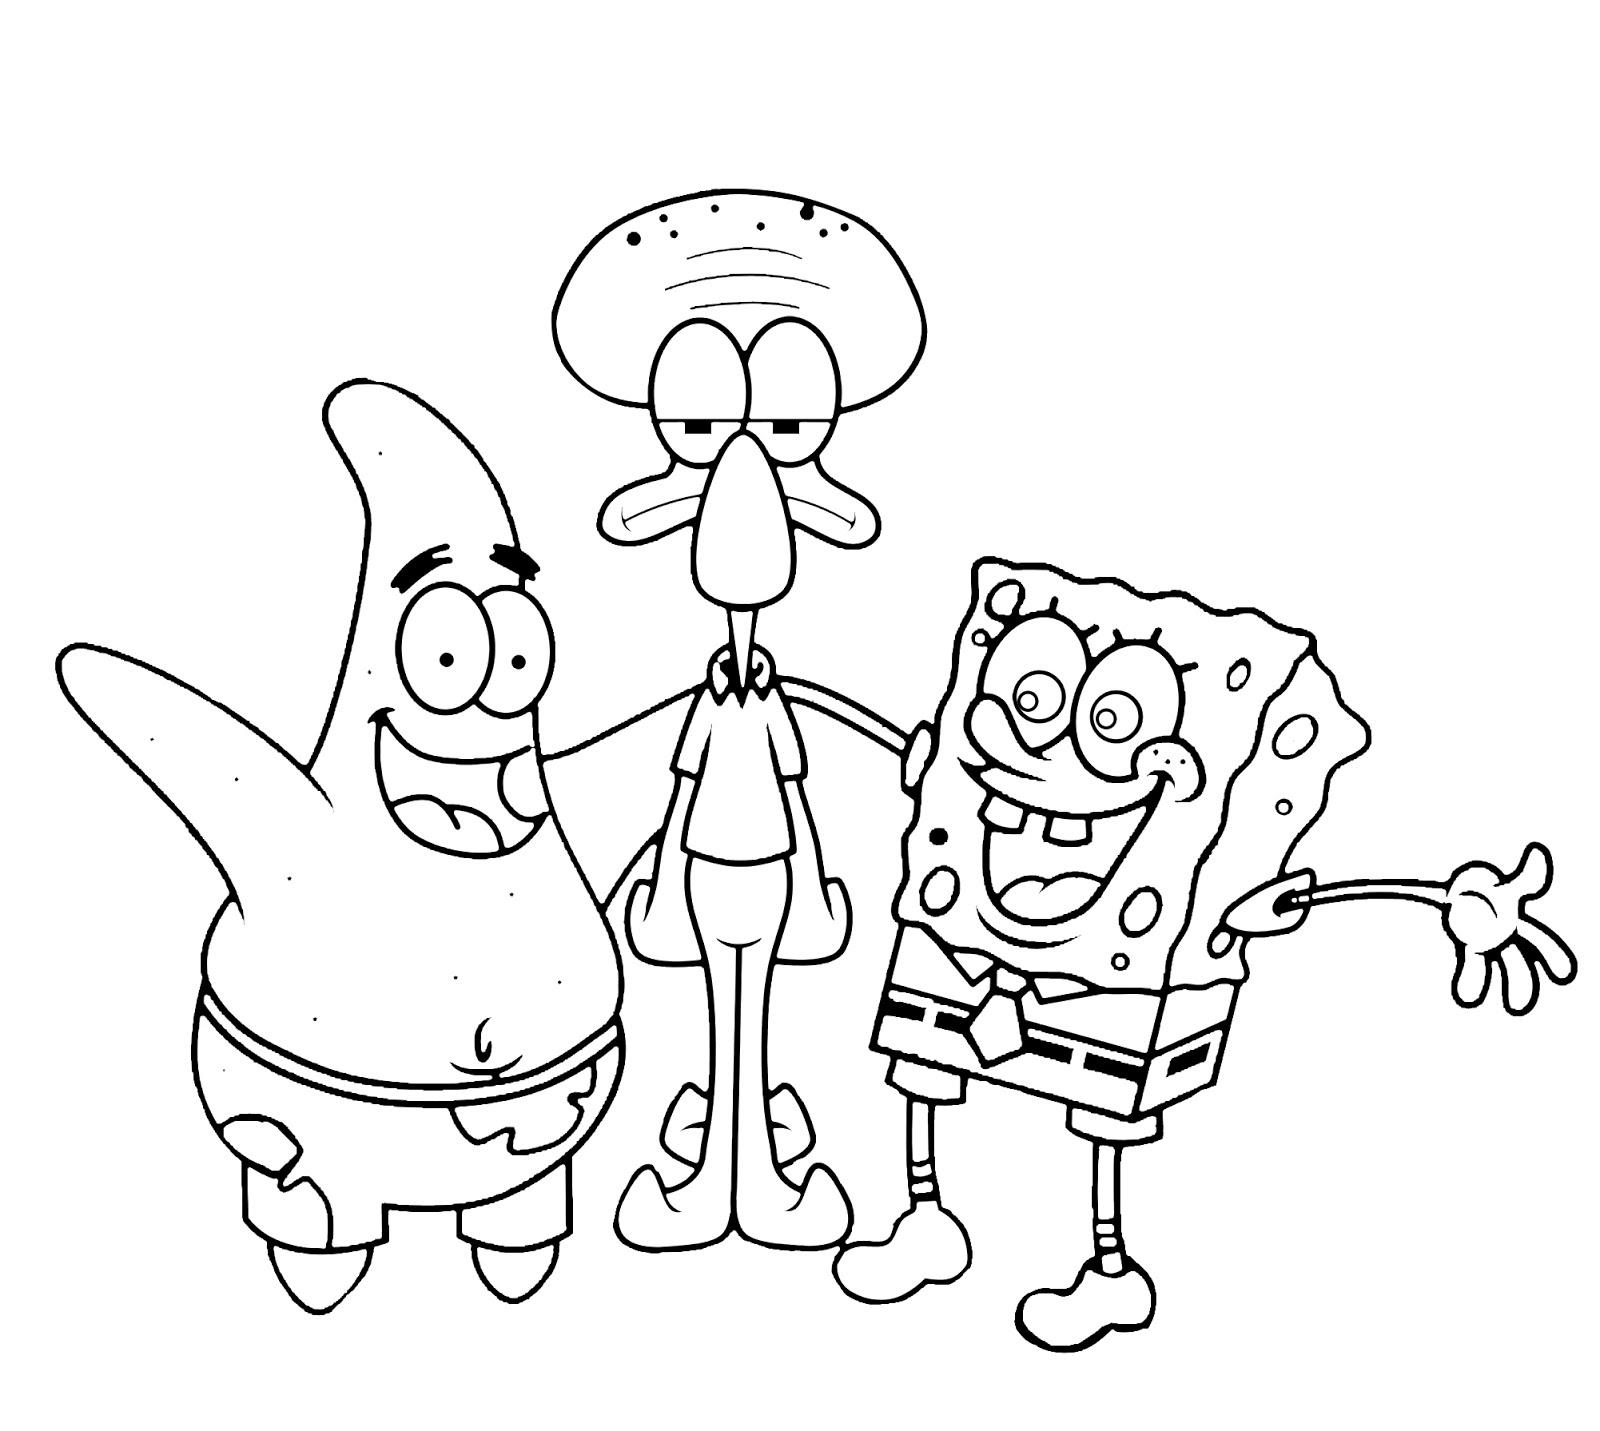 Sketsa Mewarnai Spongebob Gambar Mewarnai Spongebob